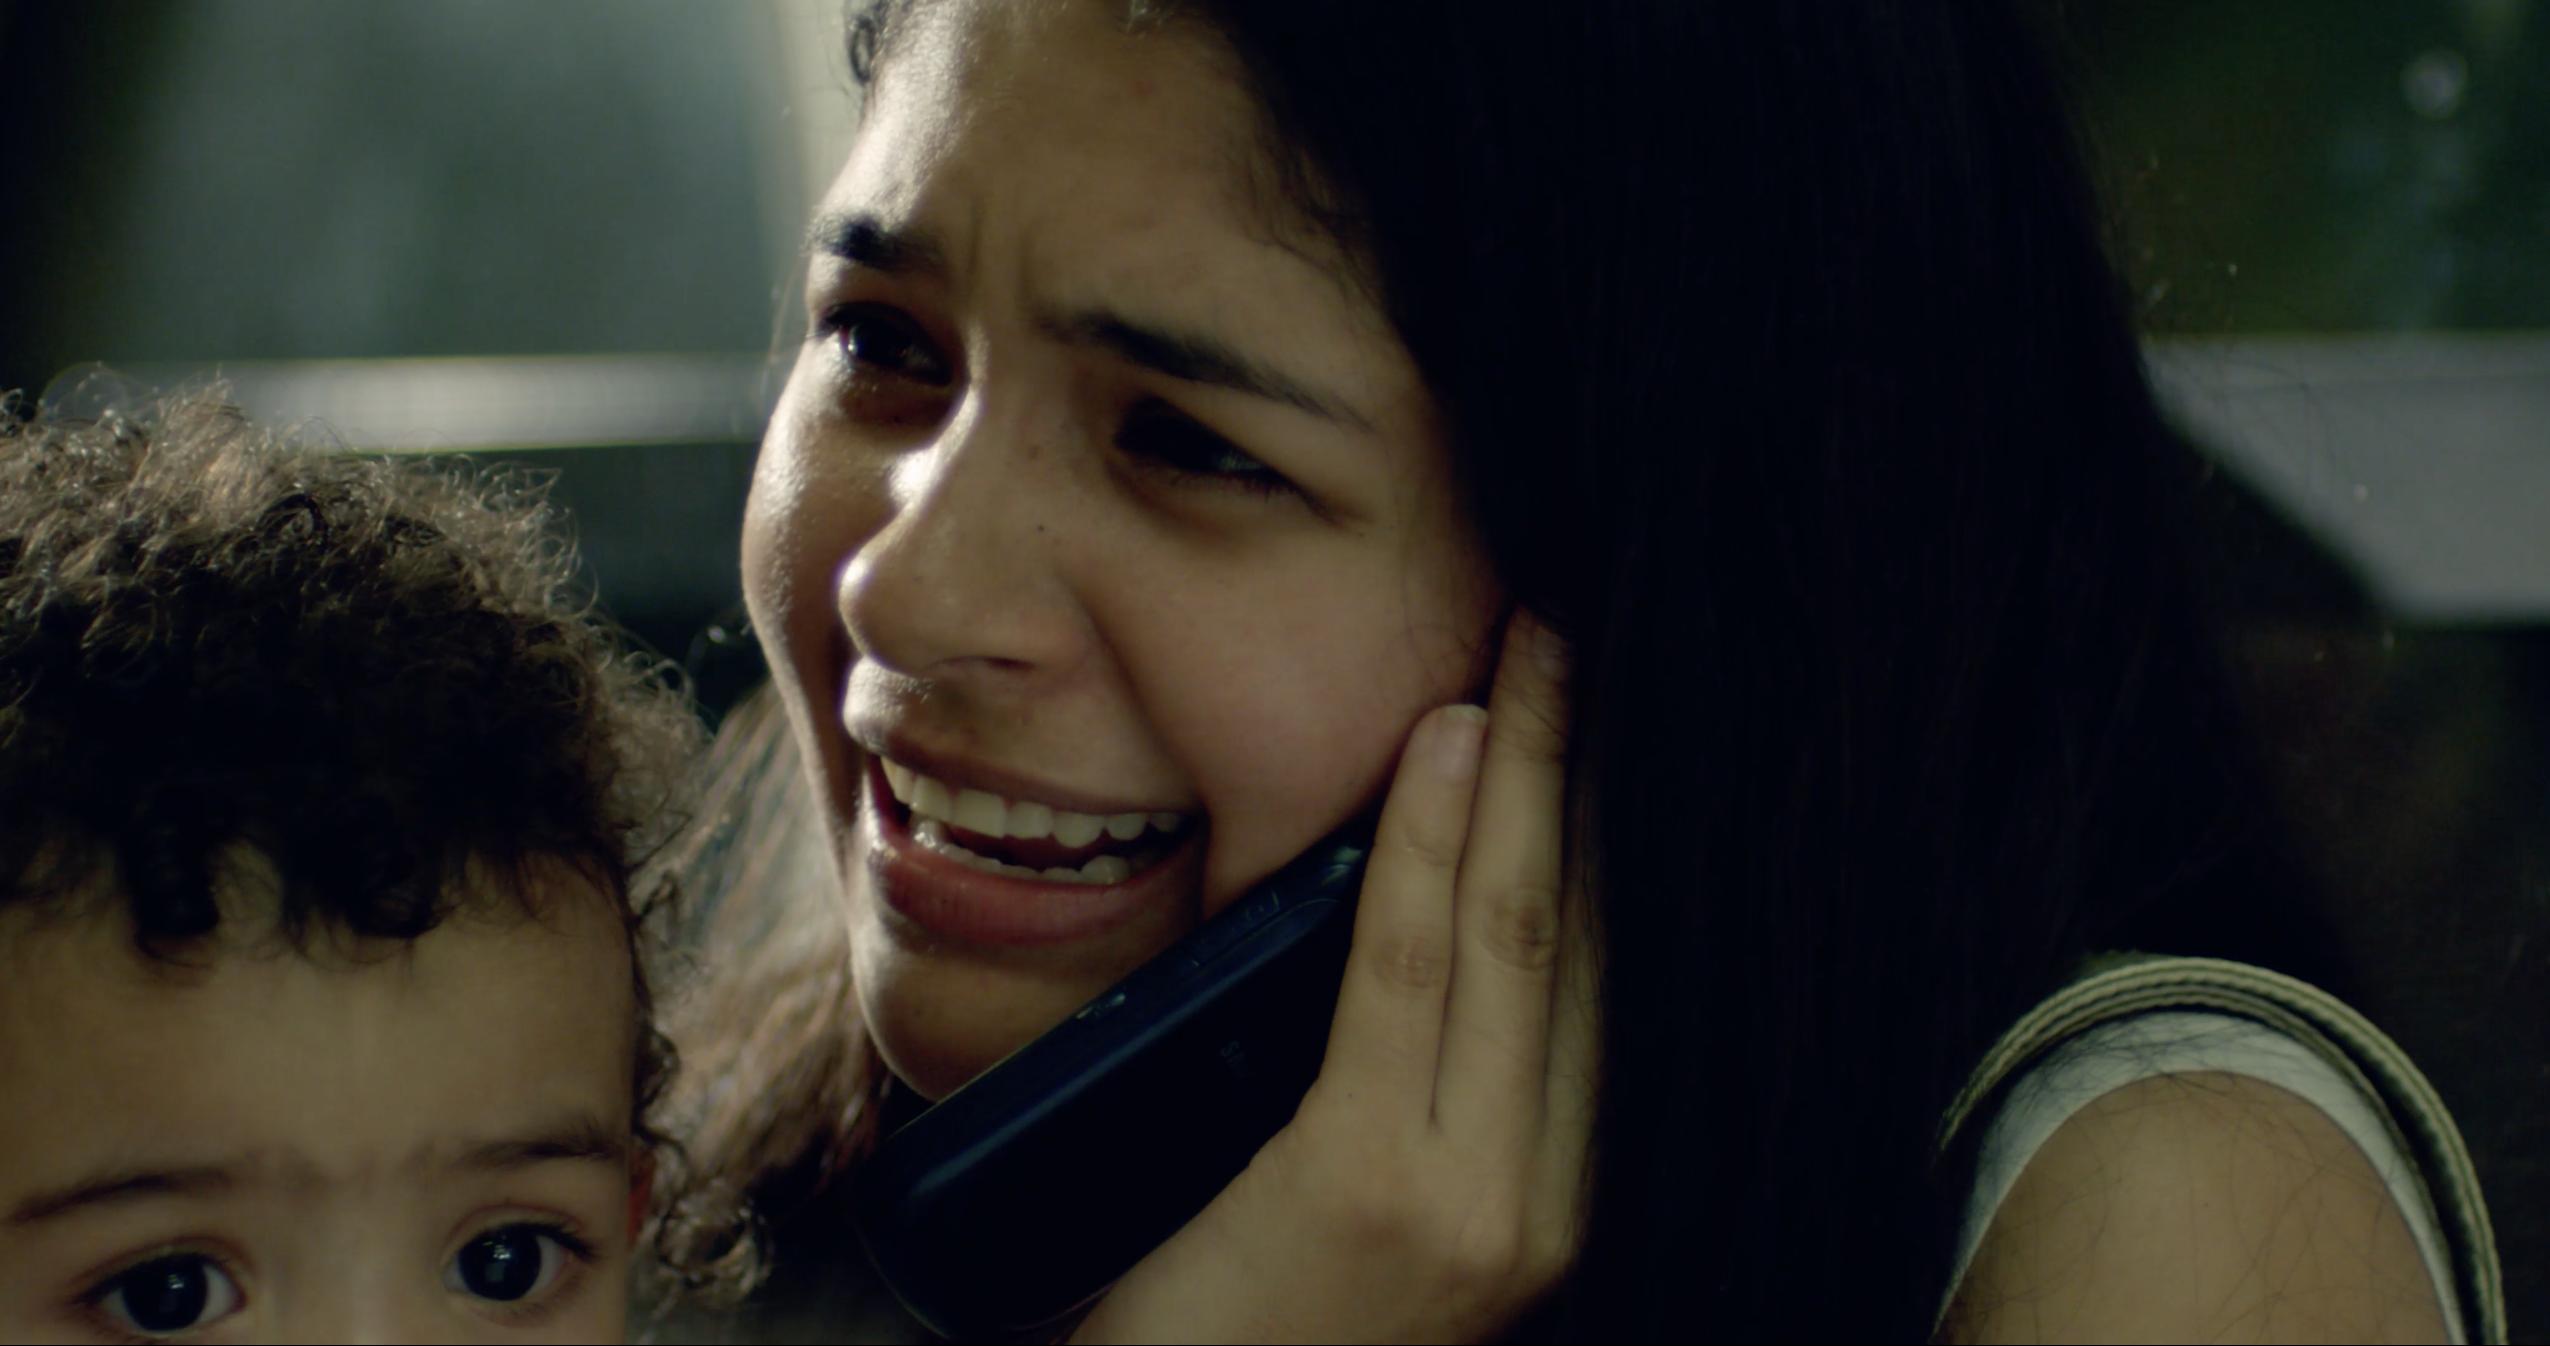 Malabar, Nati (Gabriela Serrano) calls for help